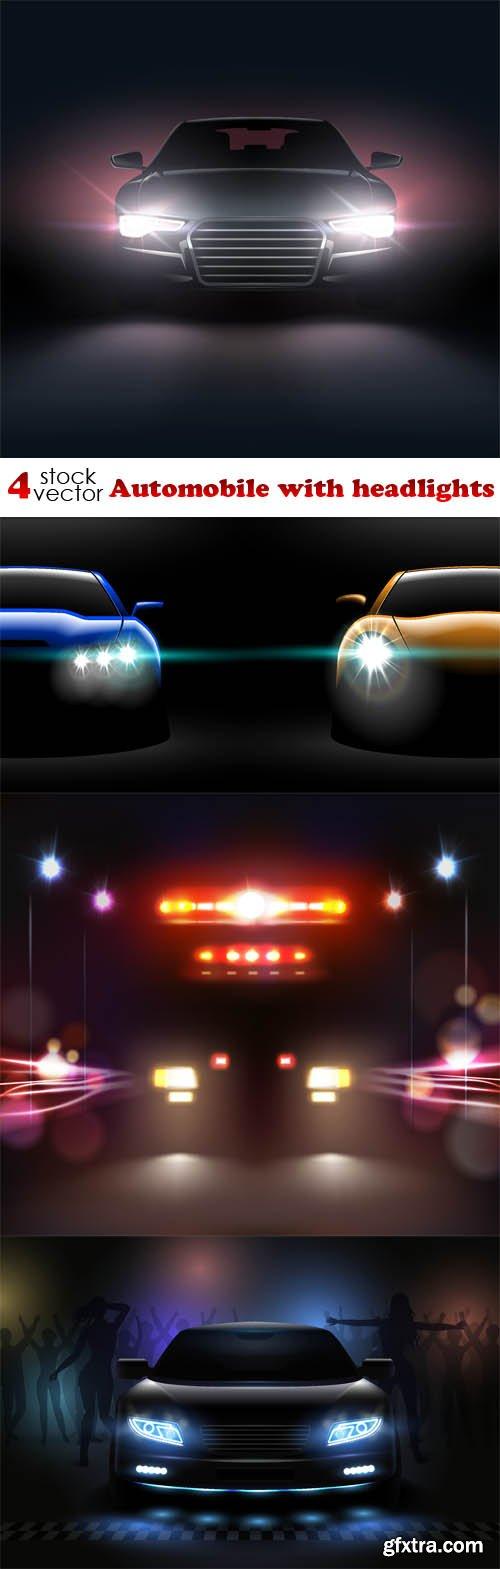 Vectors - Automobile with headlights